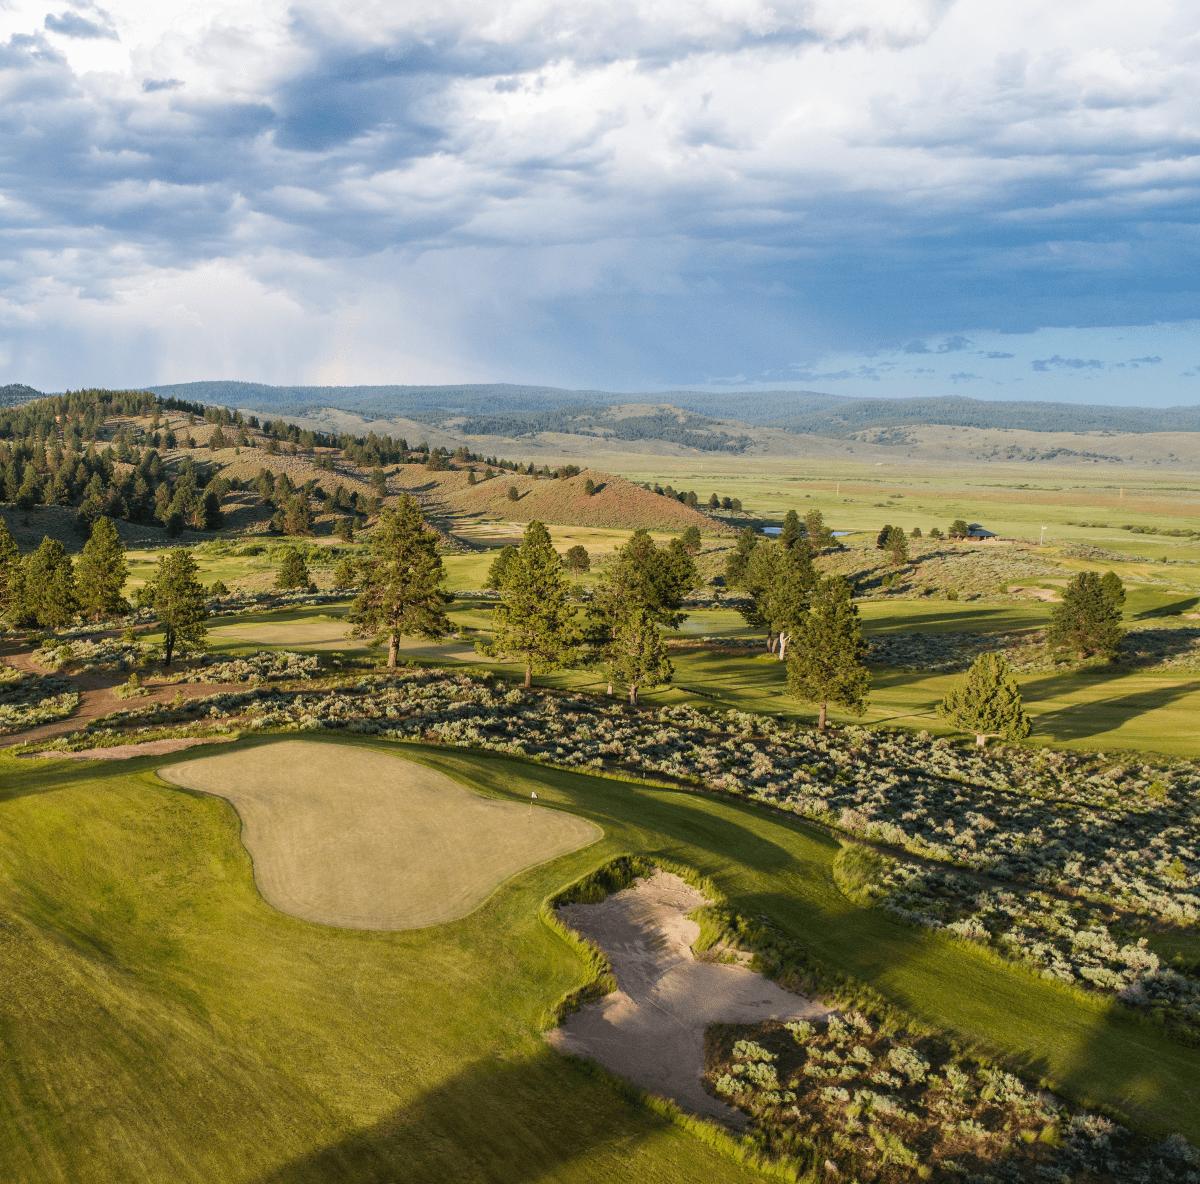 Silvies Valley Ranch Golf A Seasoned Golfer S Opinion Golf Courses Valley Ranch Golf Course Reviews